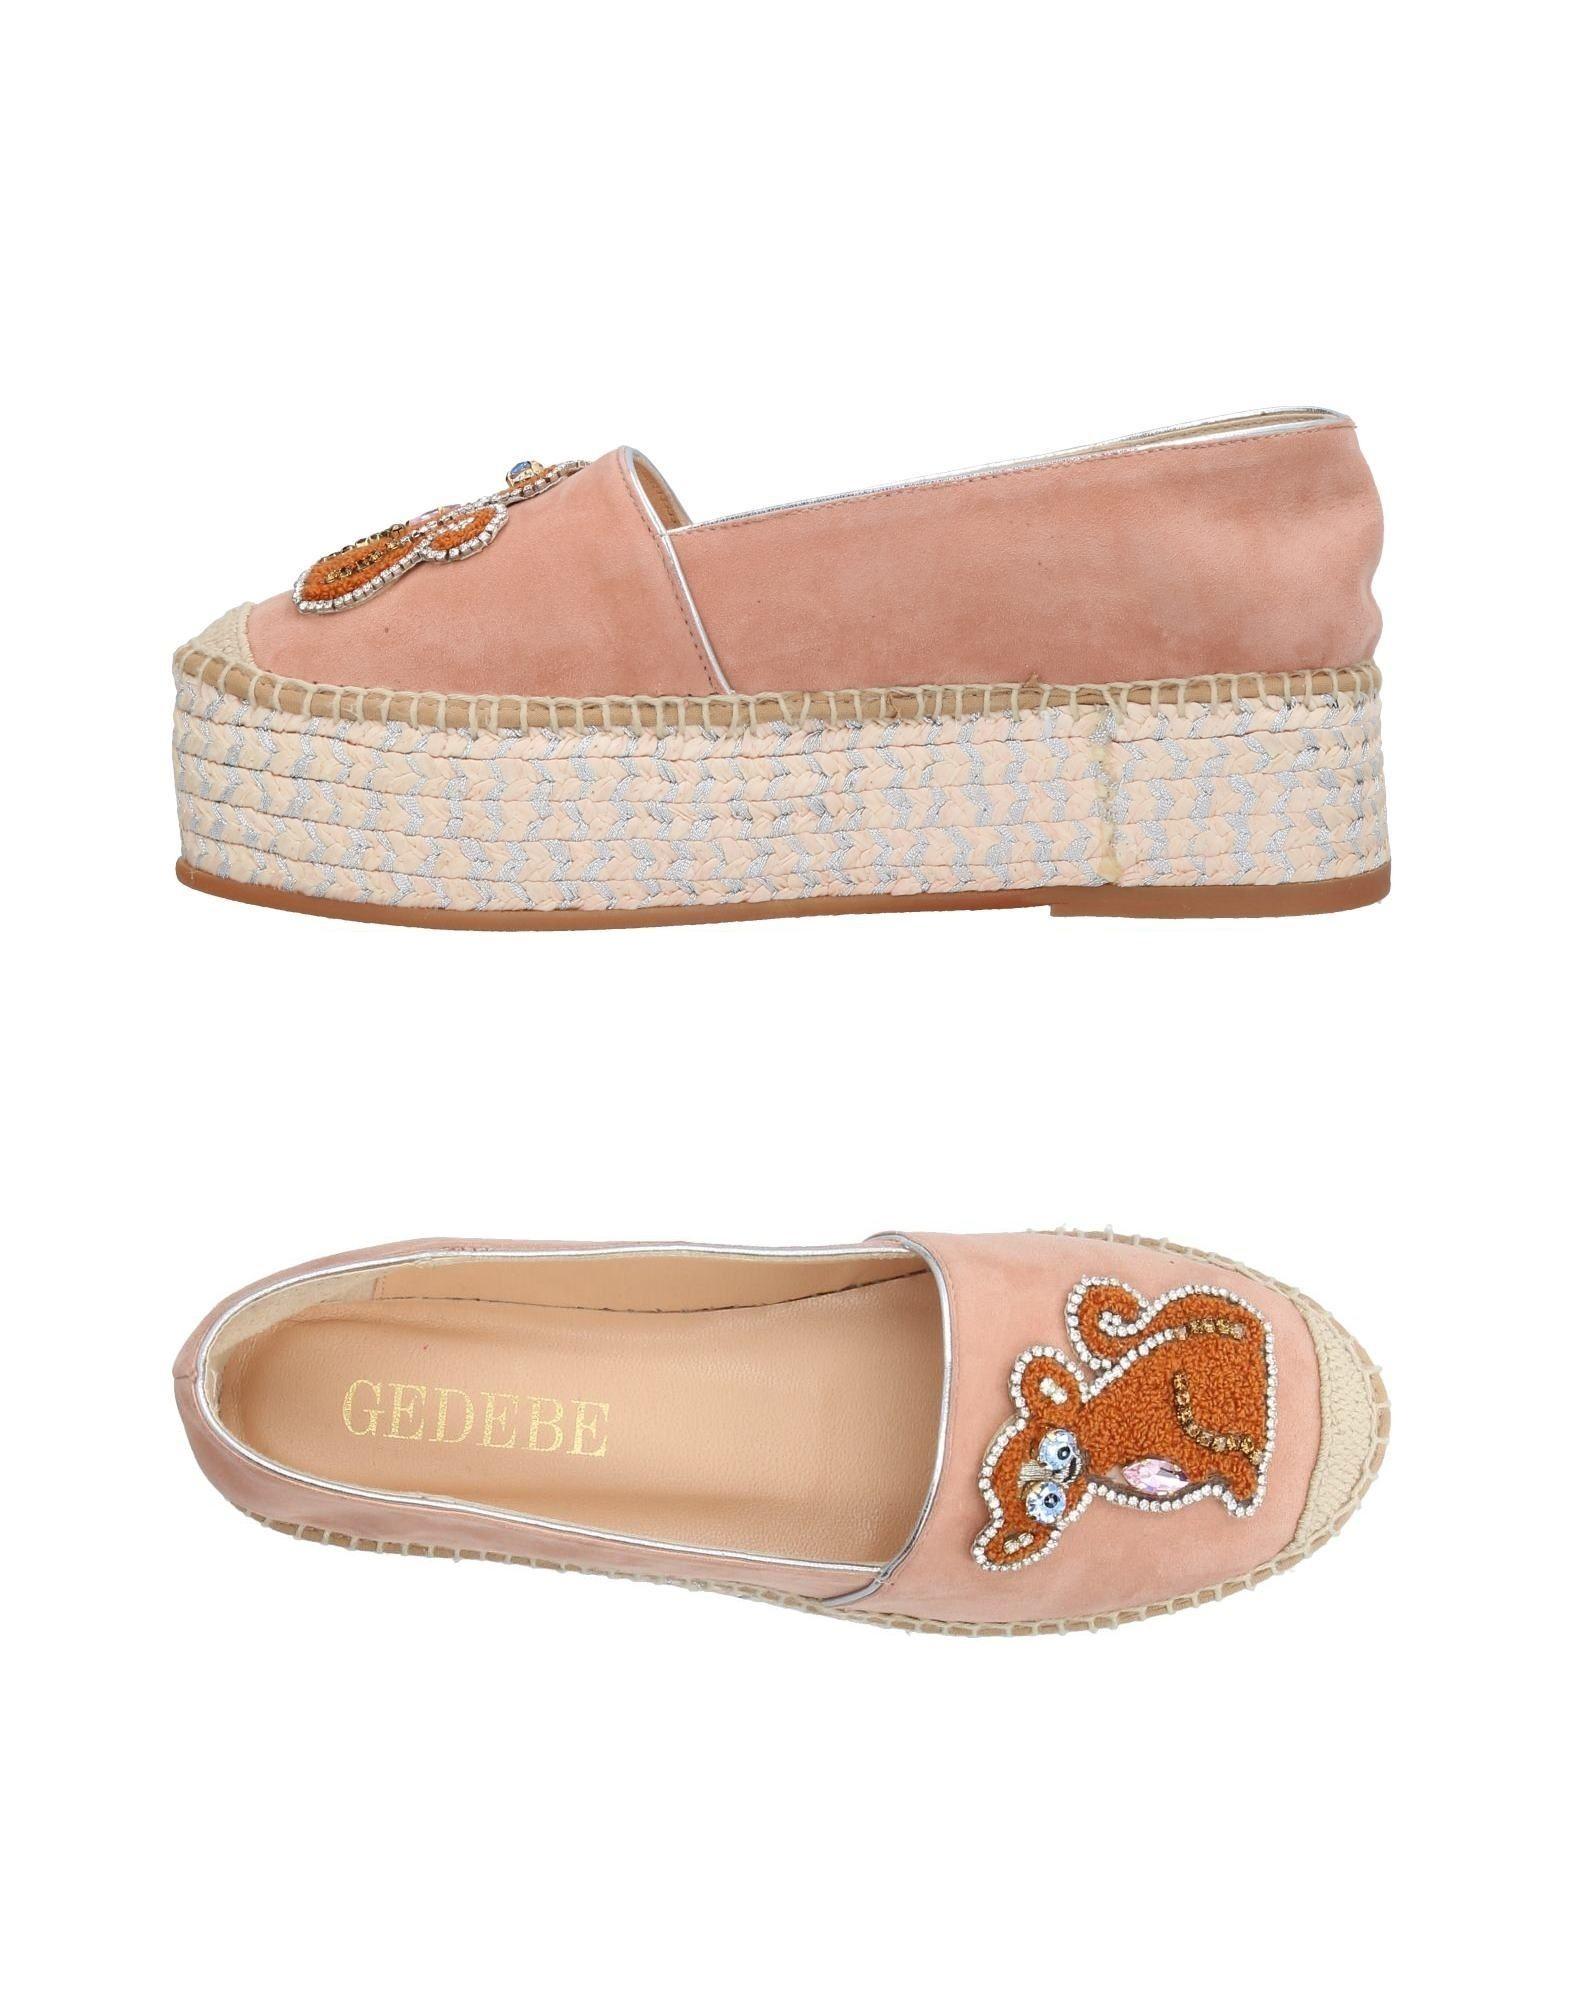 Gedebe Espadrilles Damen    11390147AI Heiße Schuhe 323430